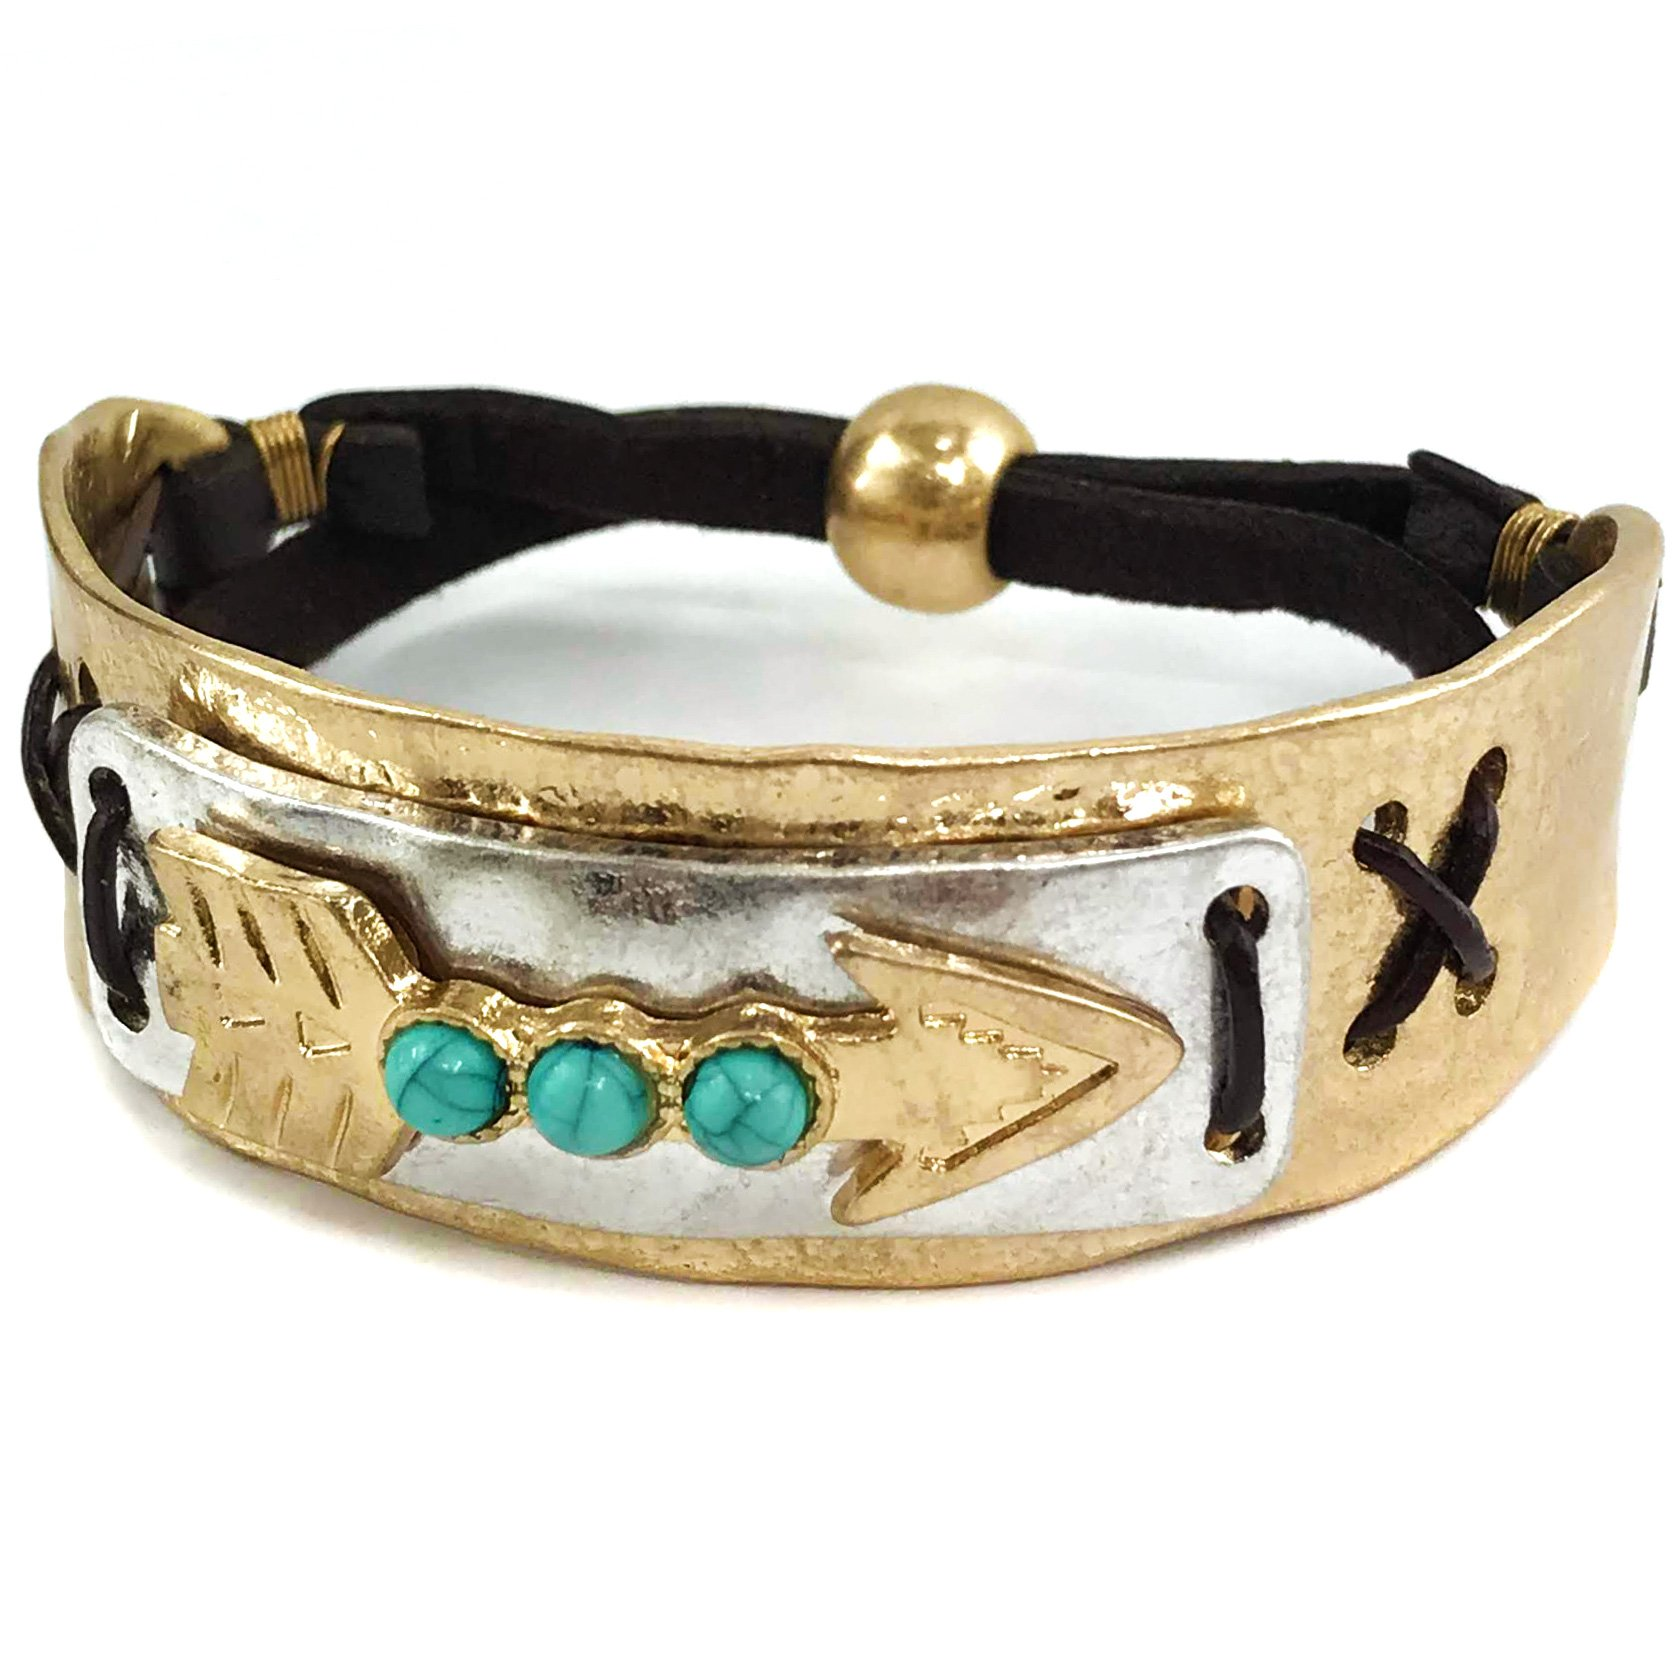 Western Peak Western Tritone Hammered Plate Arrow Turquoise Leather Cuff Bracelet (Gold)